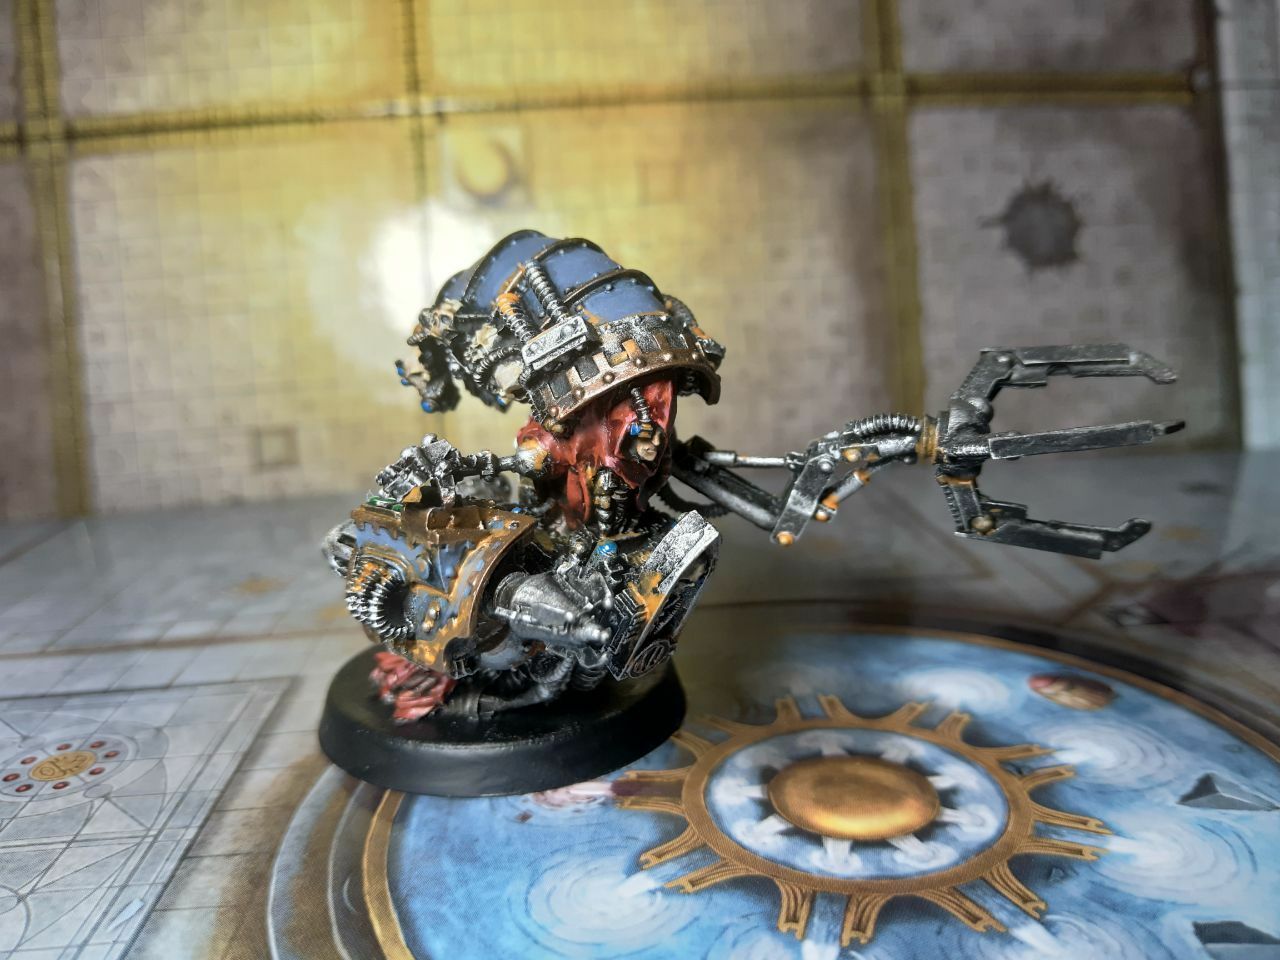 Magos Dominus con Rad-Limpiador Pintado Raro Mechanicum Warhammer 40k